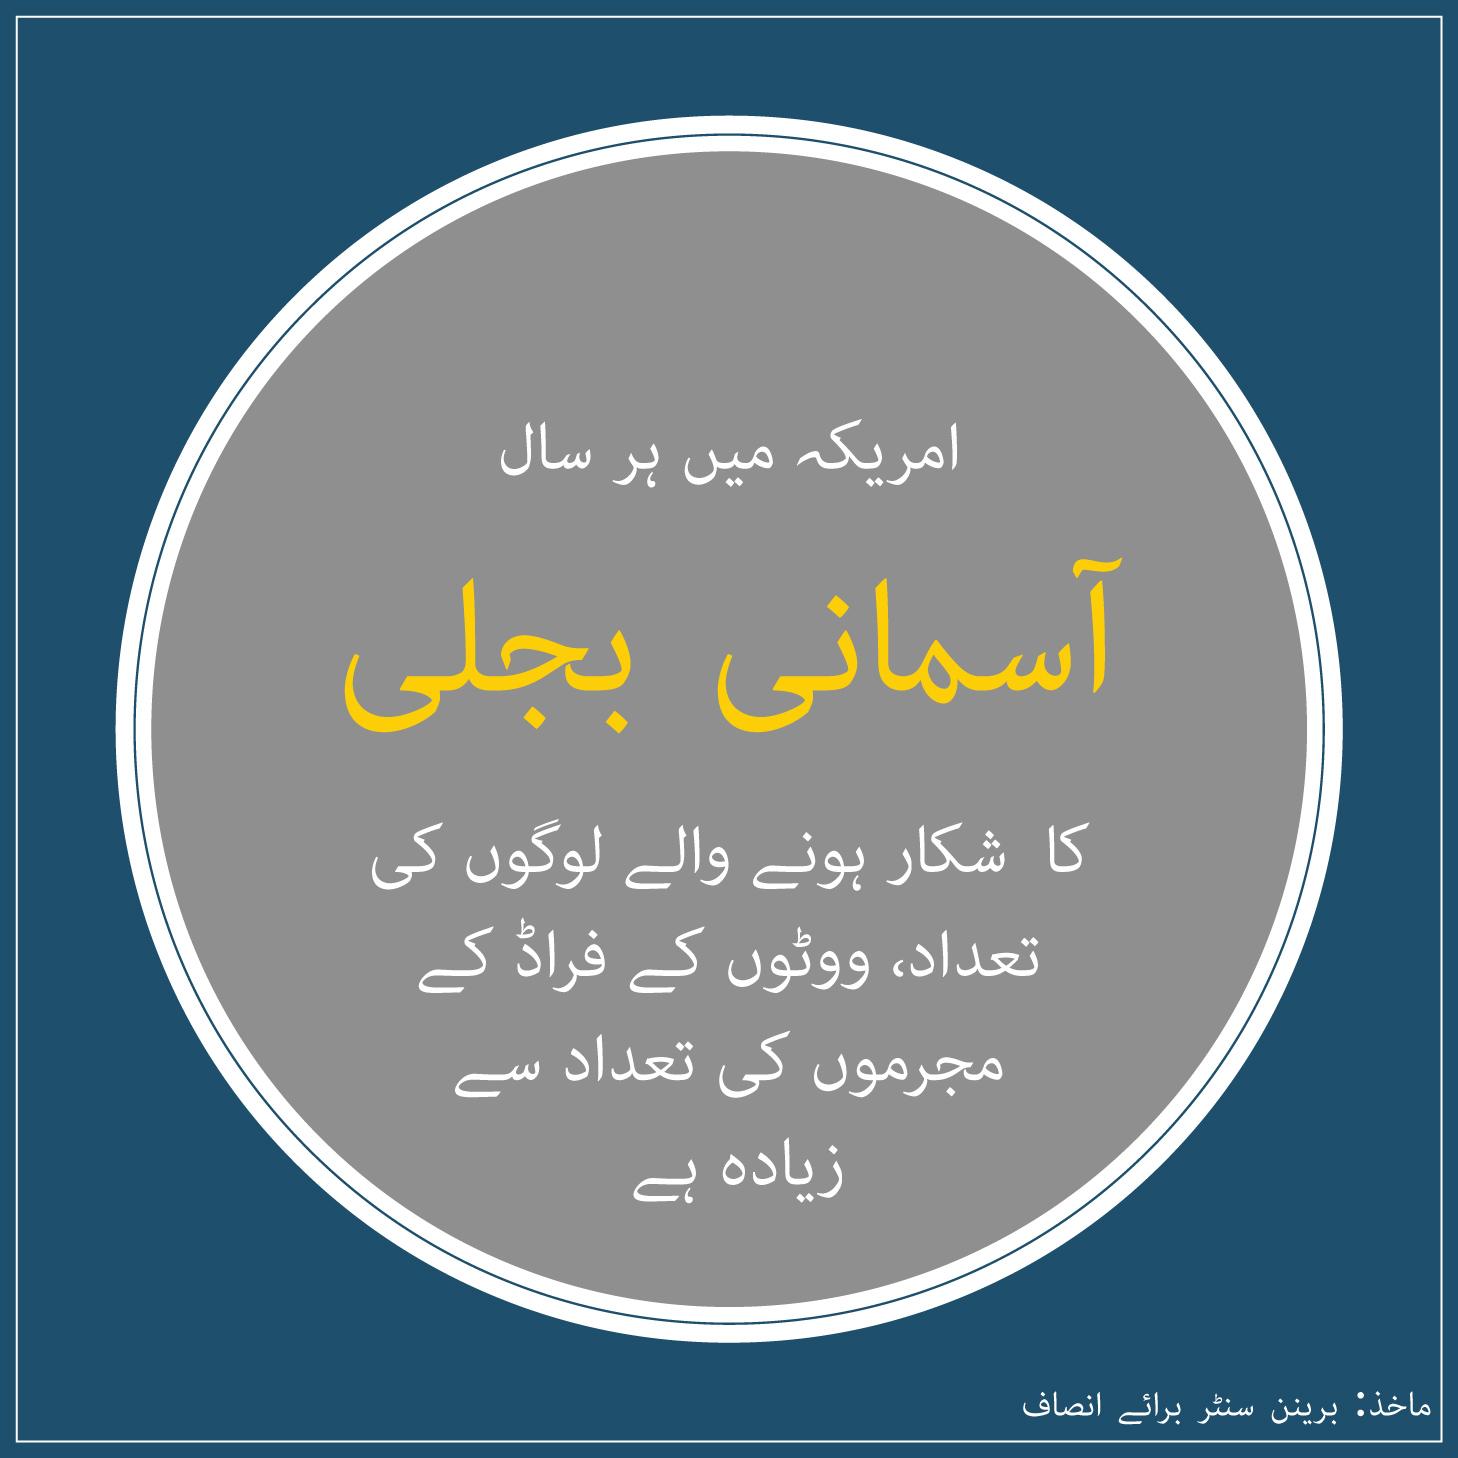 Lightning_Urdu